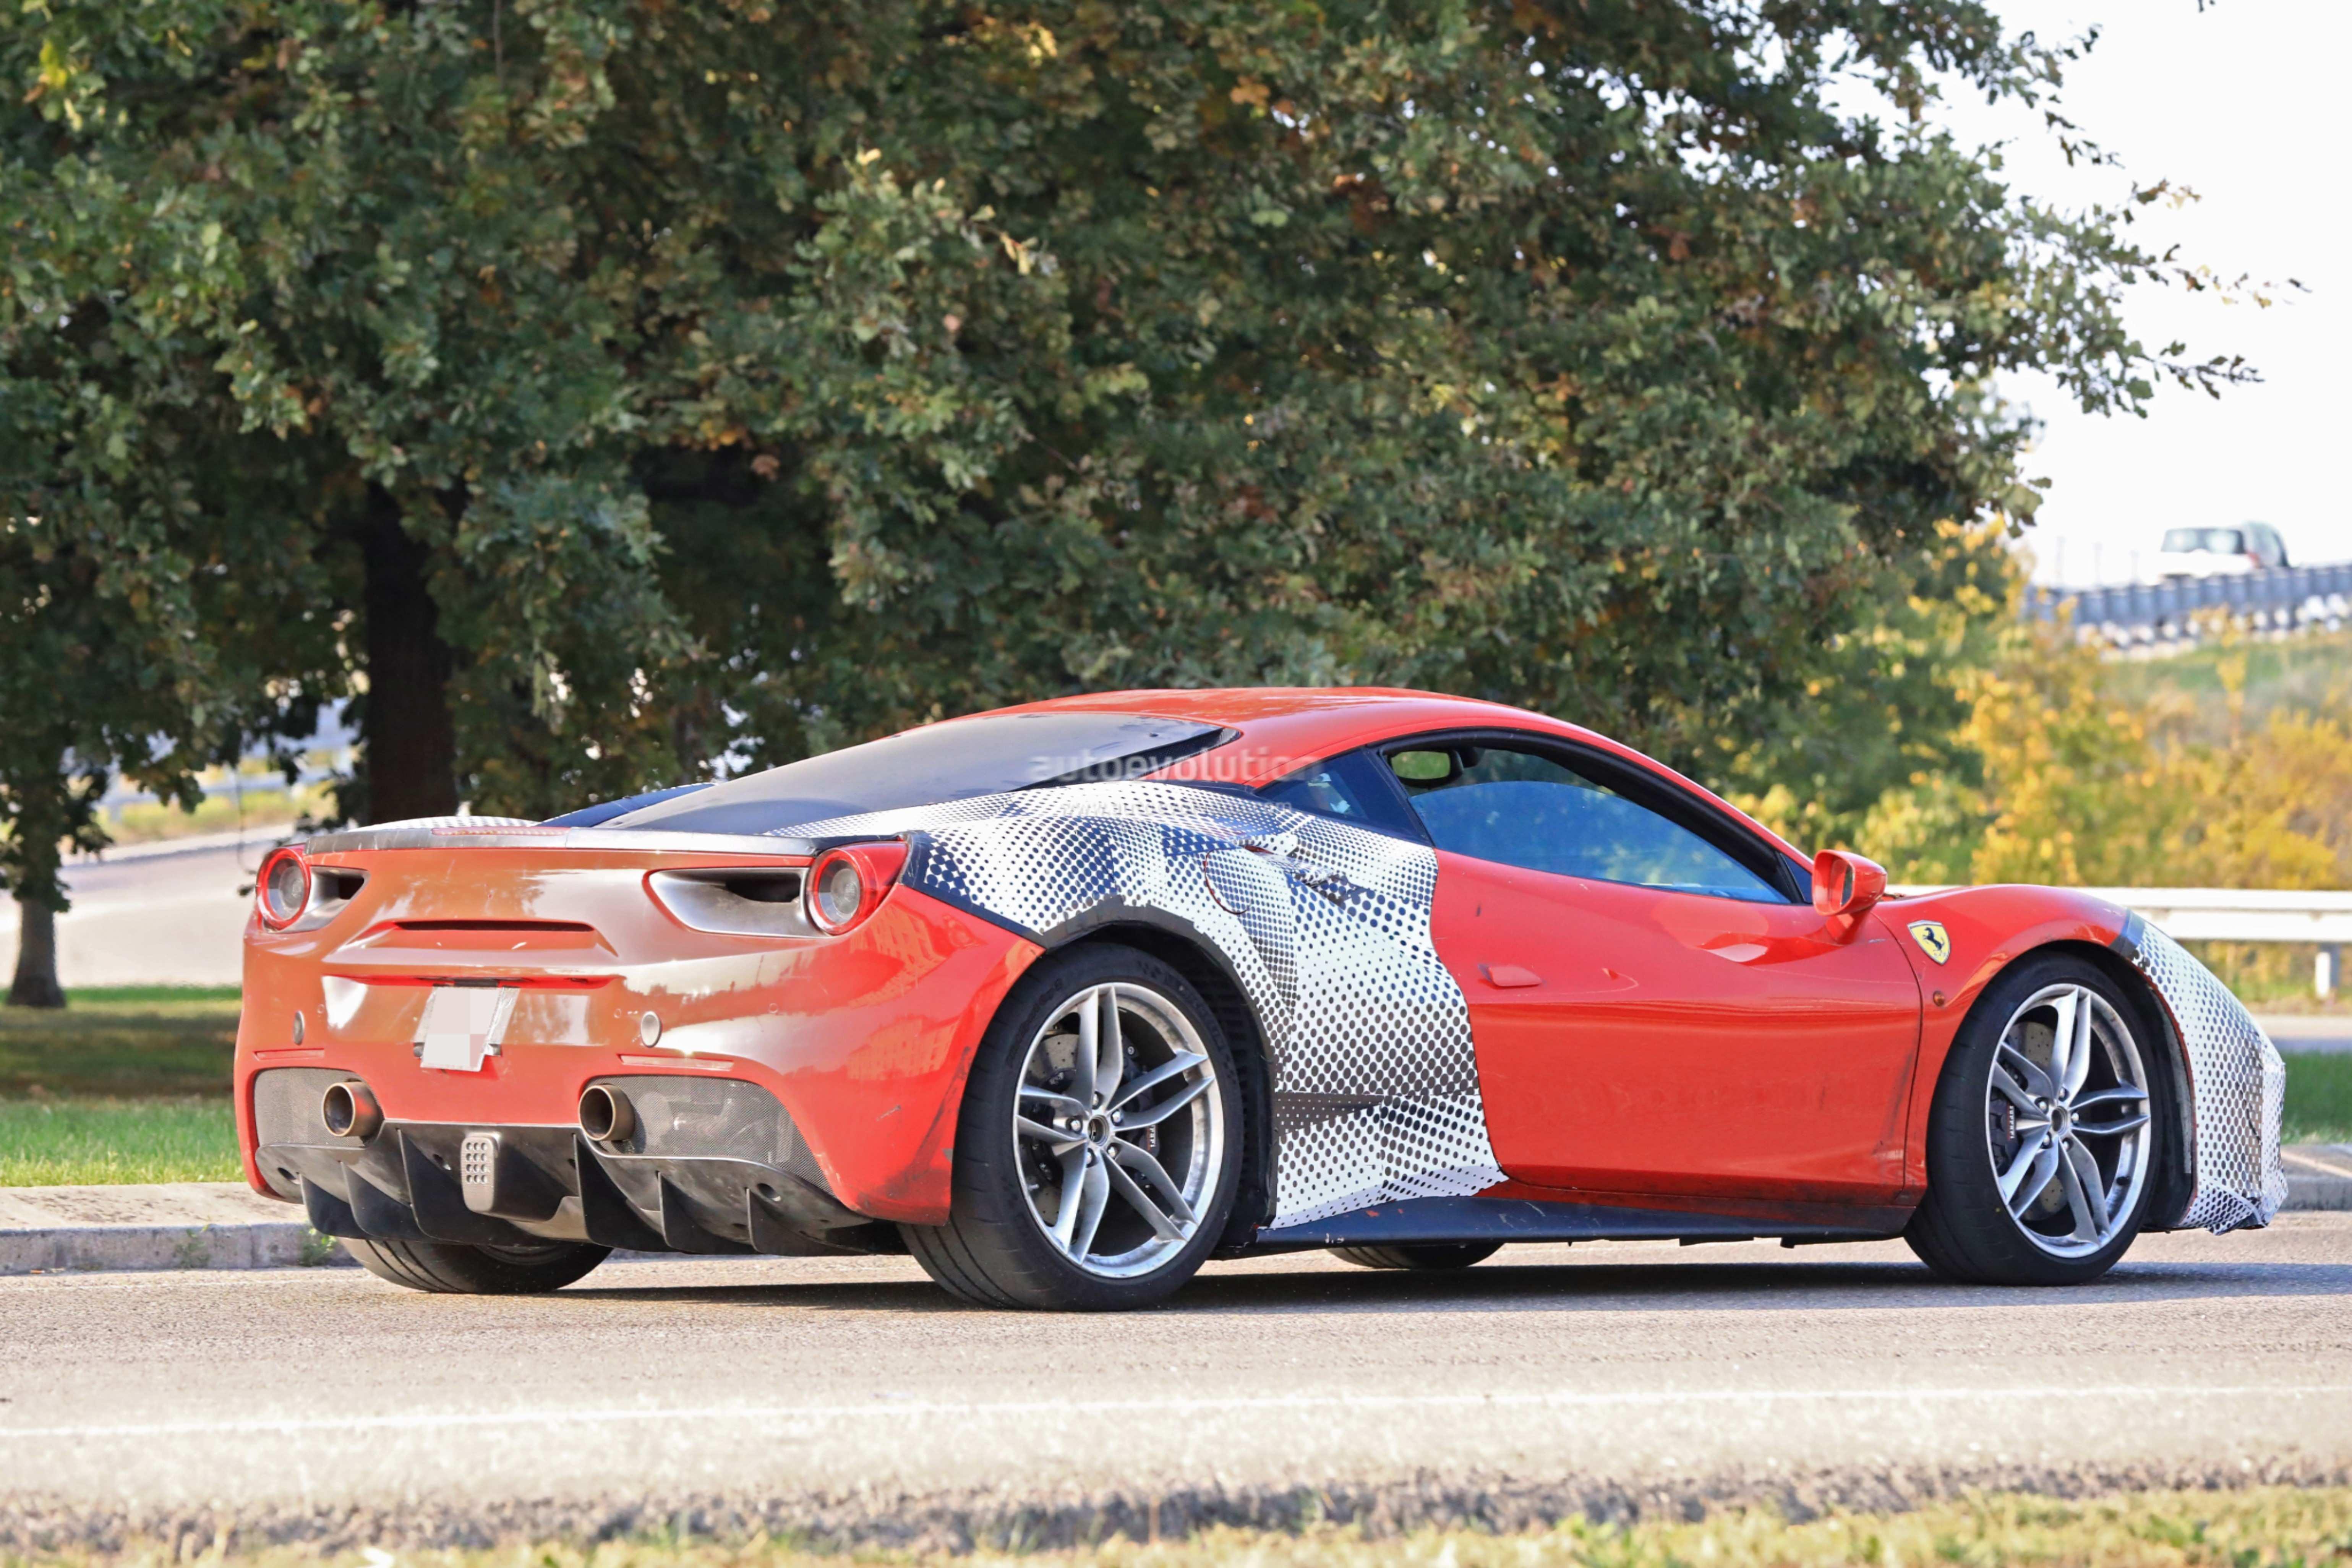 75 New 2019 Ferrari 588 Price and Review by 2019 Ferrari 588